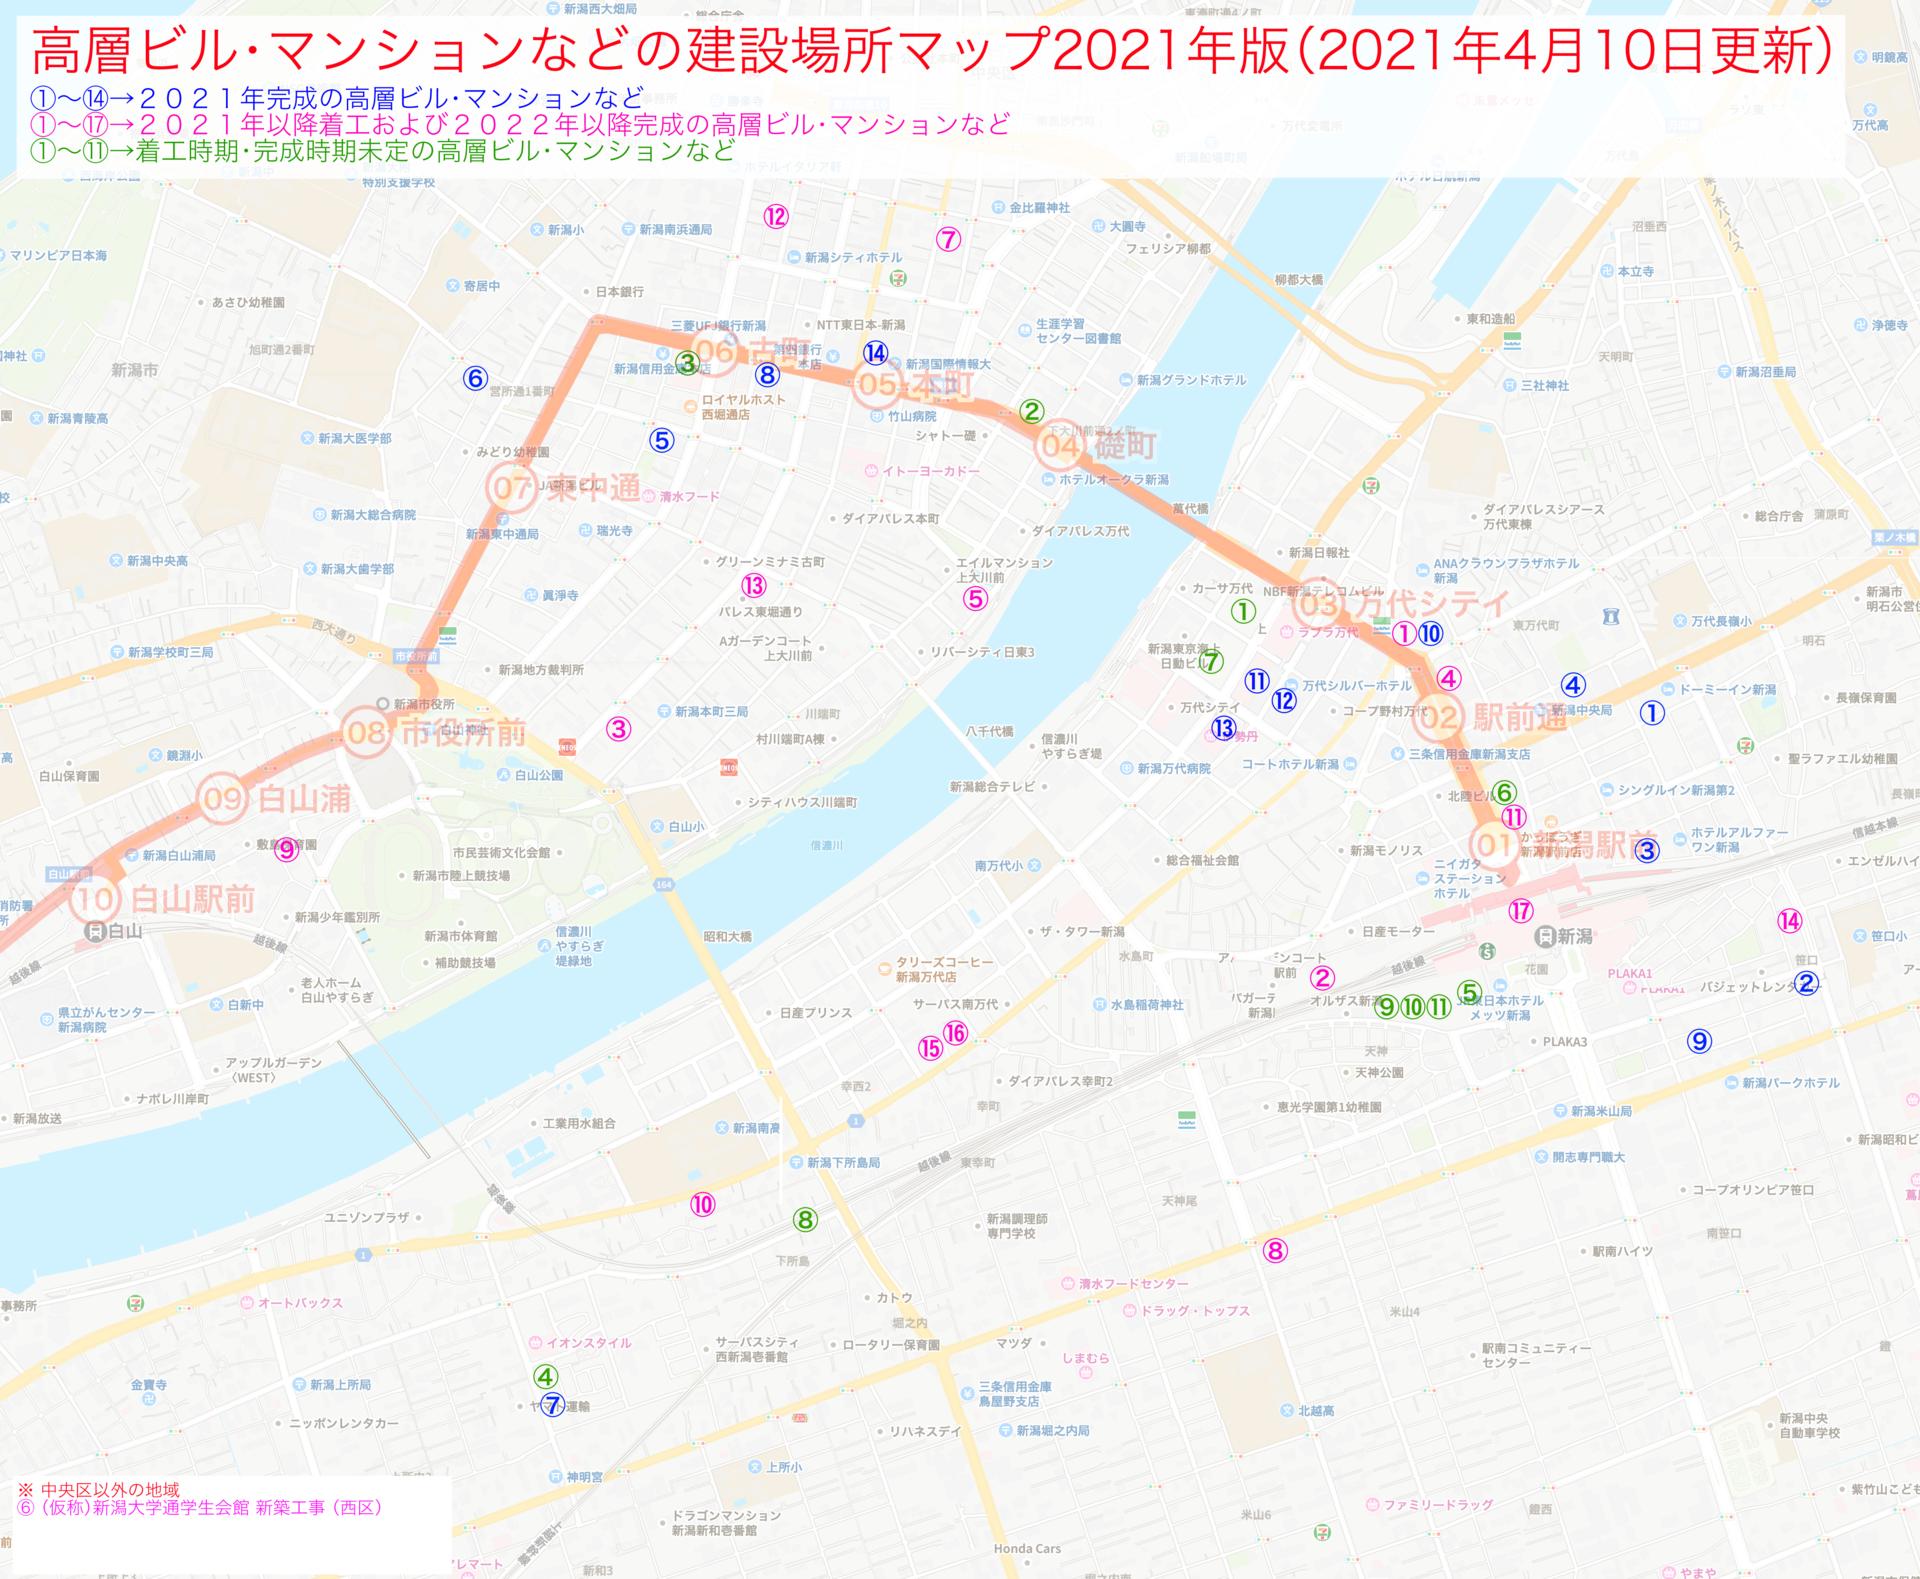 development-map20210410-3.png